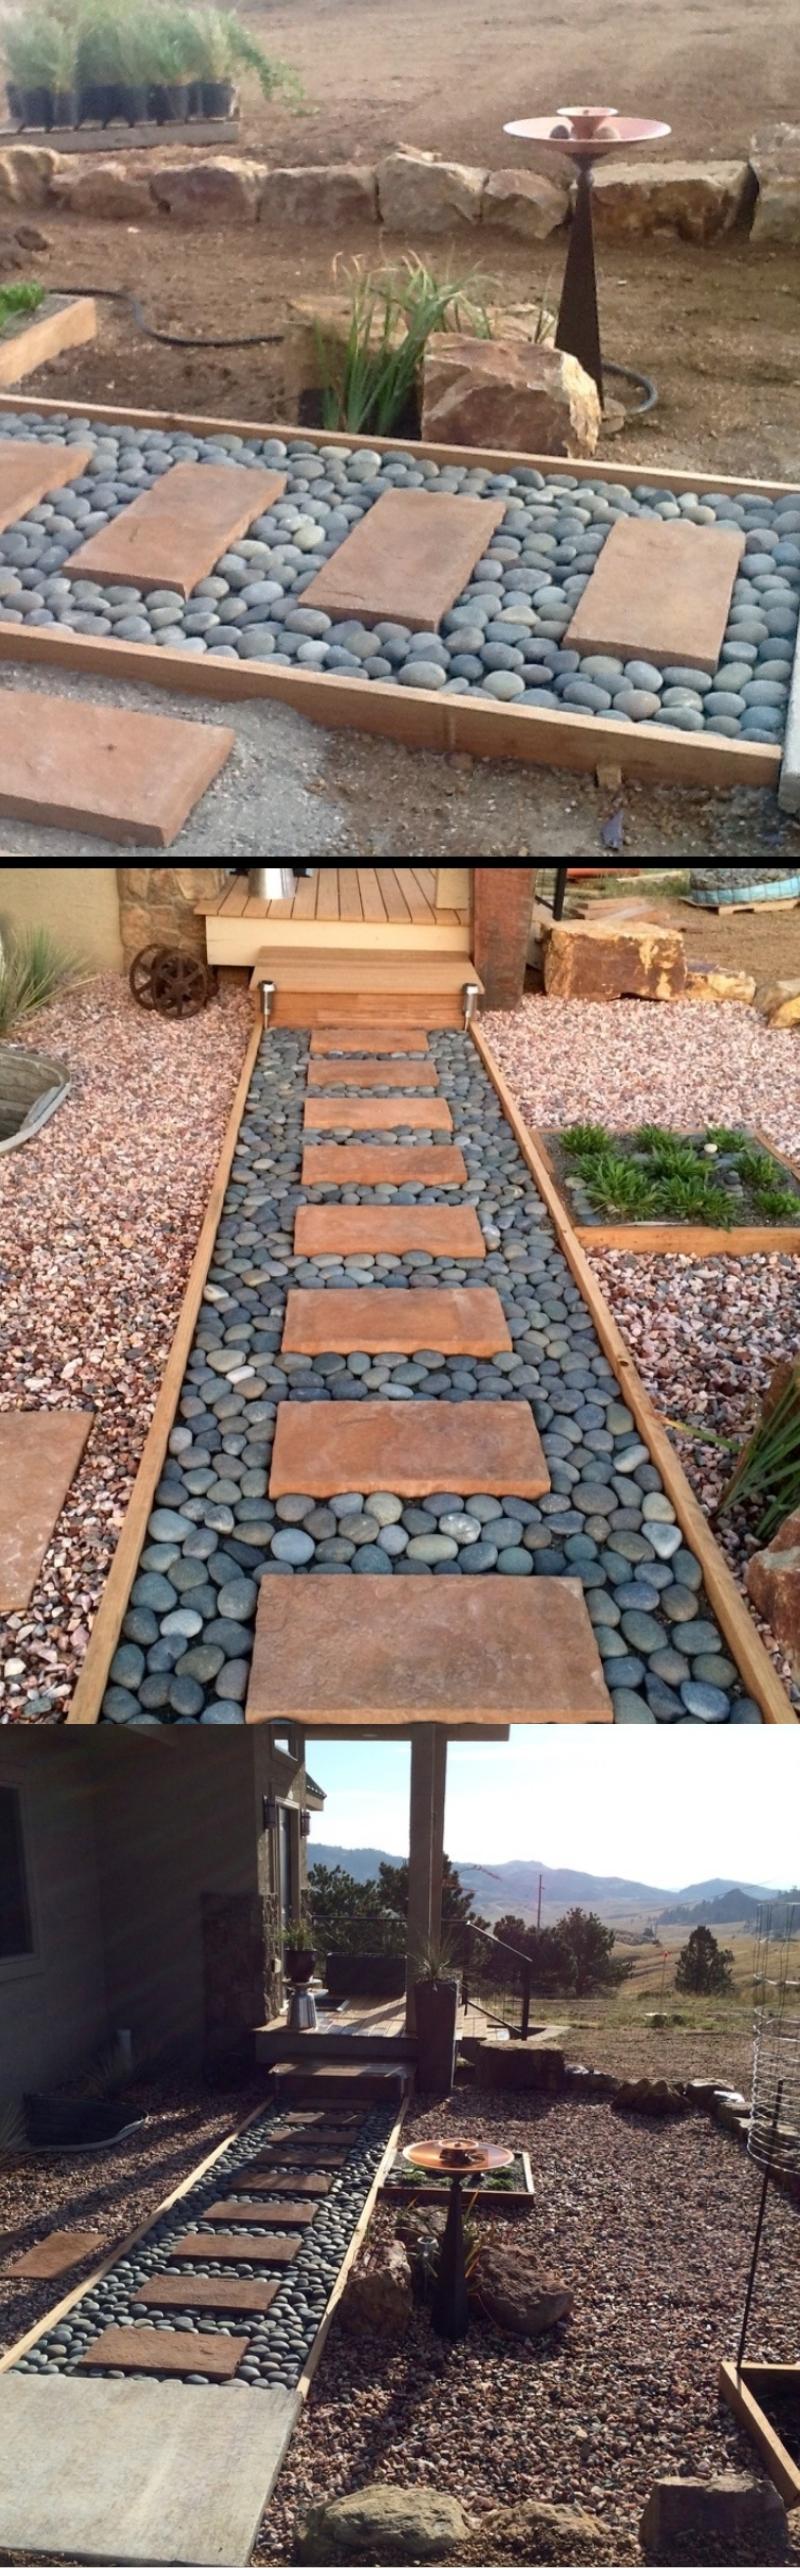 nexpensive walkway pavers